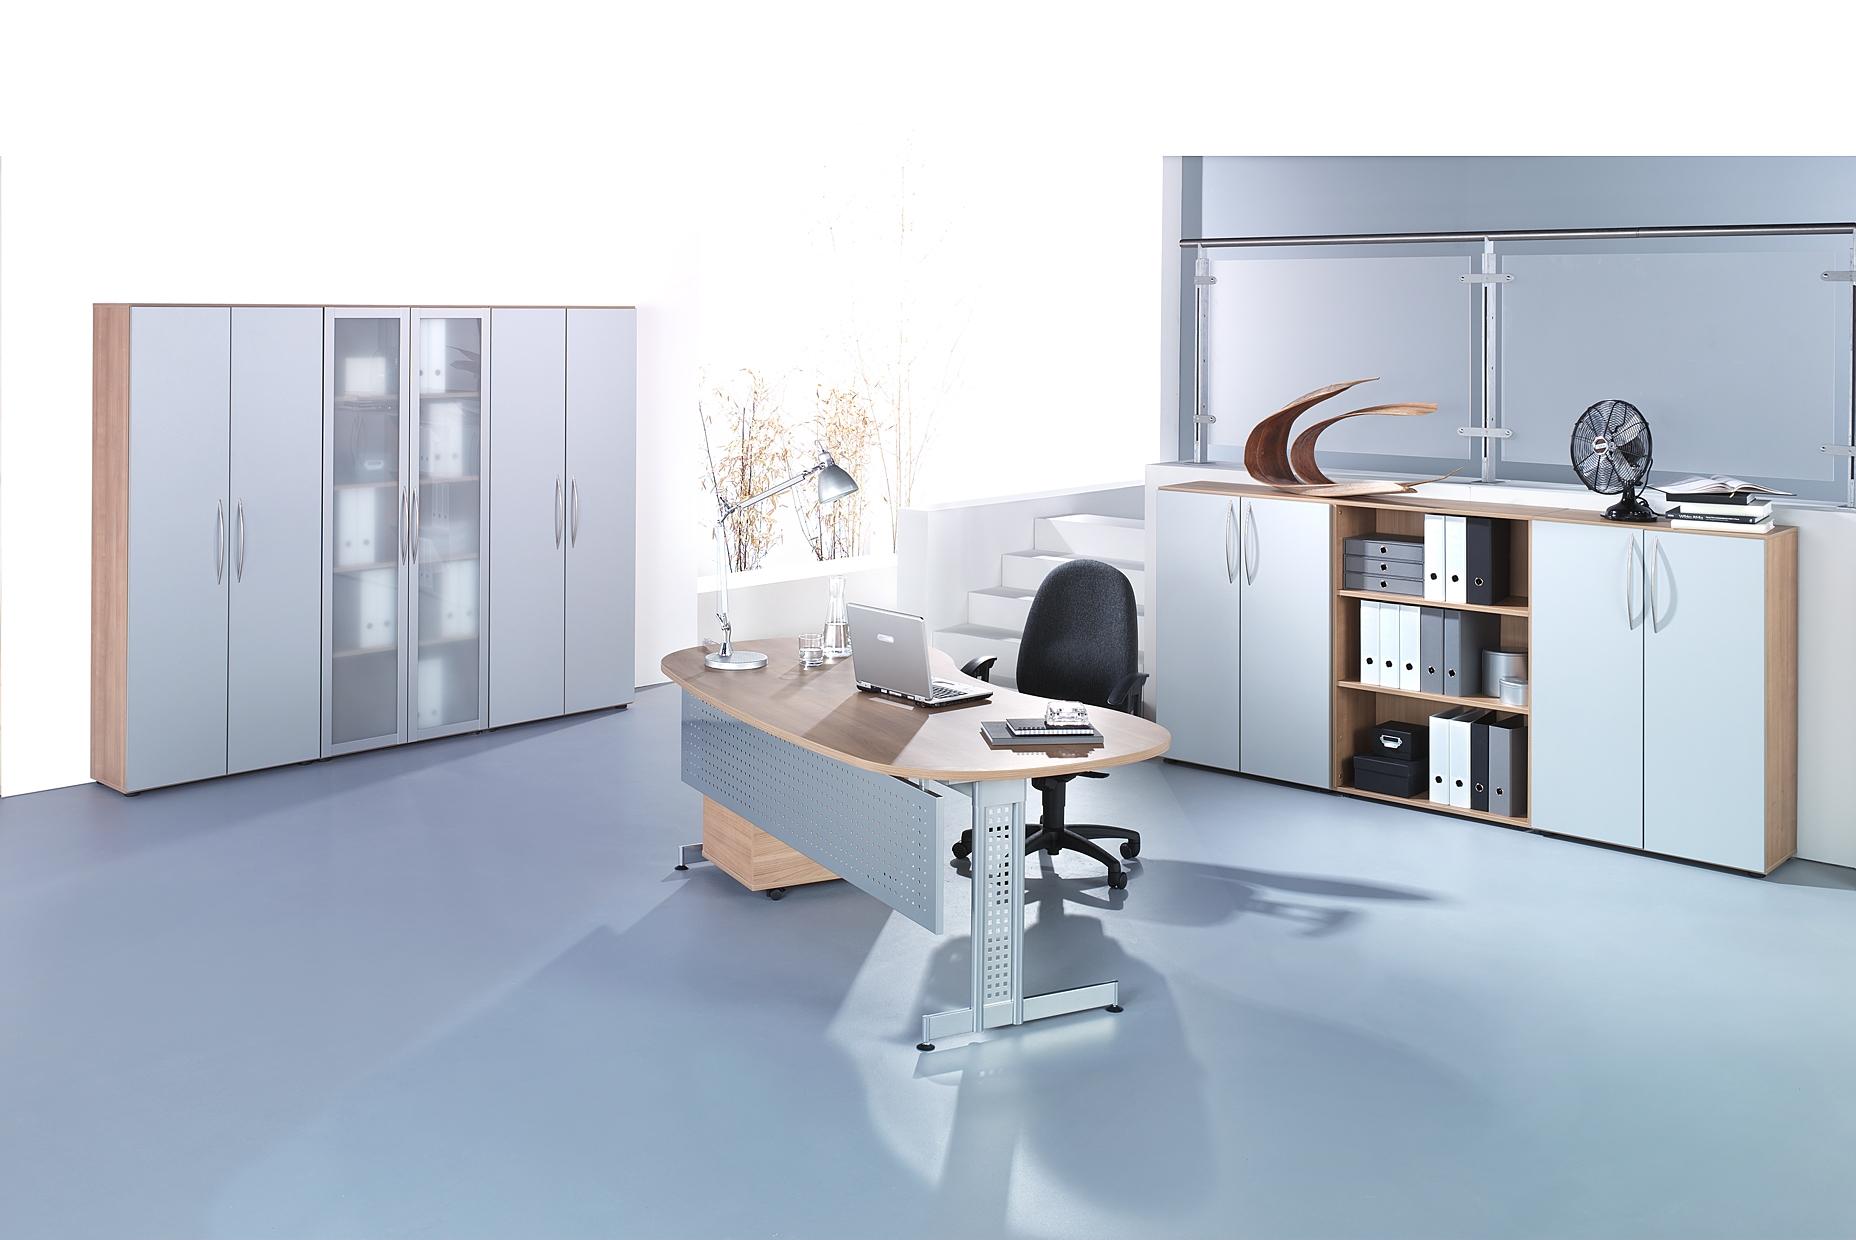 aktenschrank b roschrank regalschrank fl gelt rschrank holz wei buche b m ebay. Black Bedroom Furniture Sets. Home Design Ideas